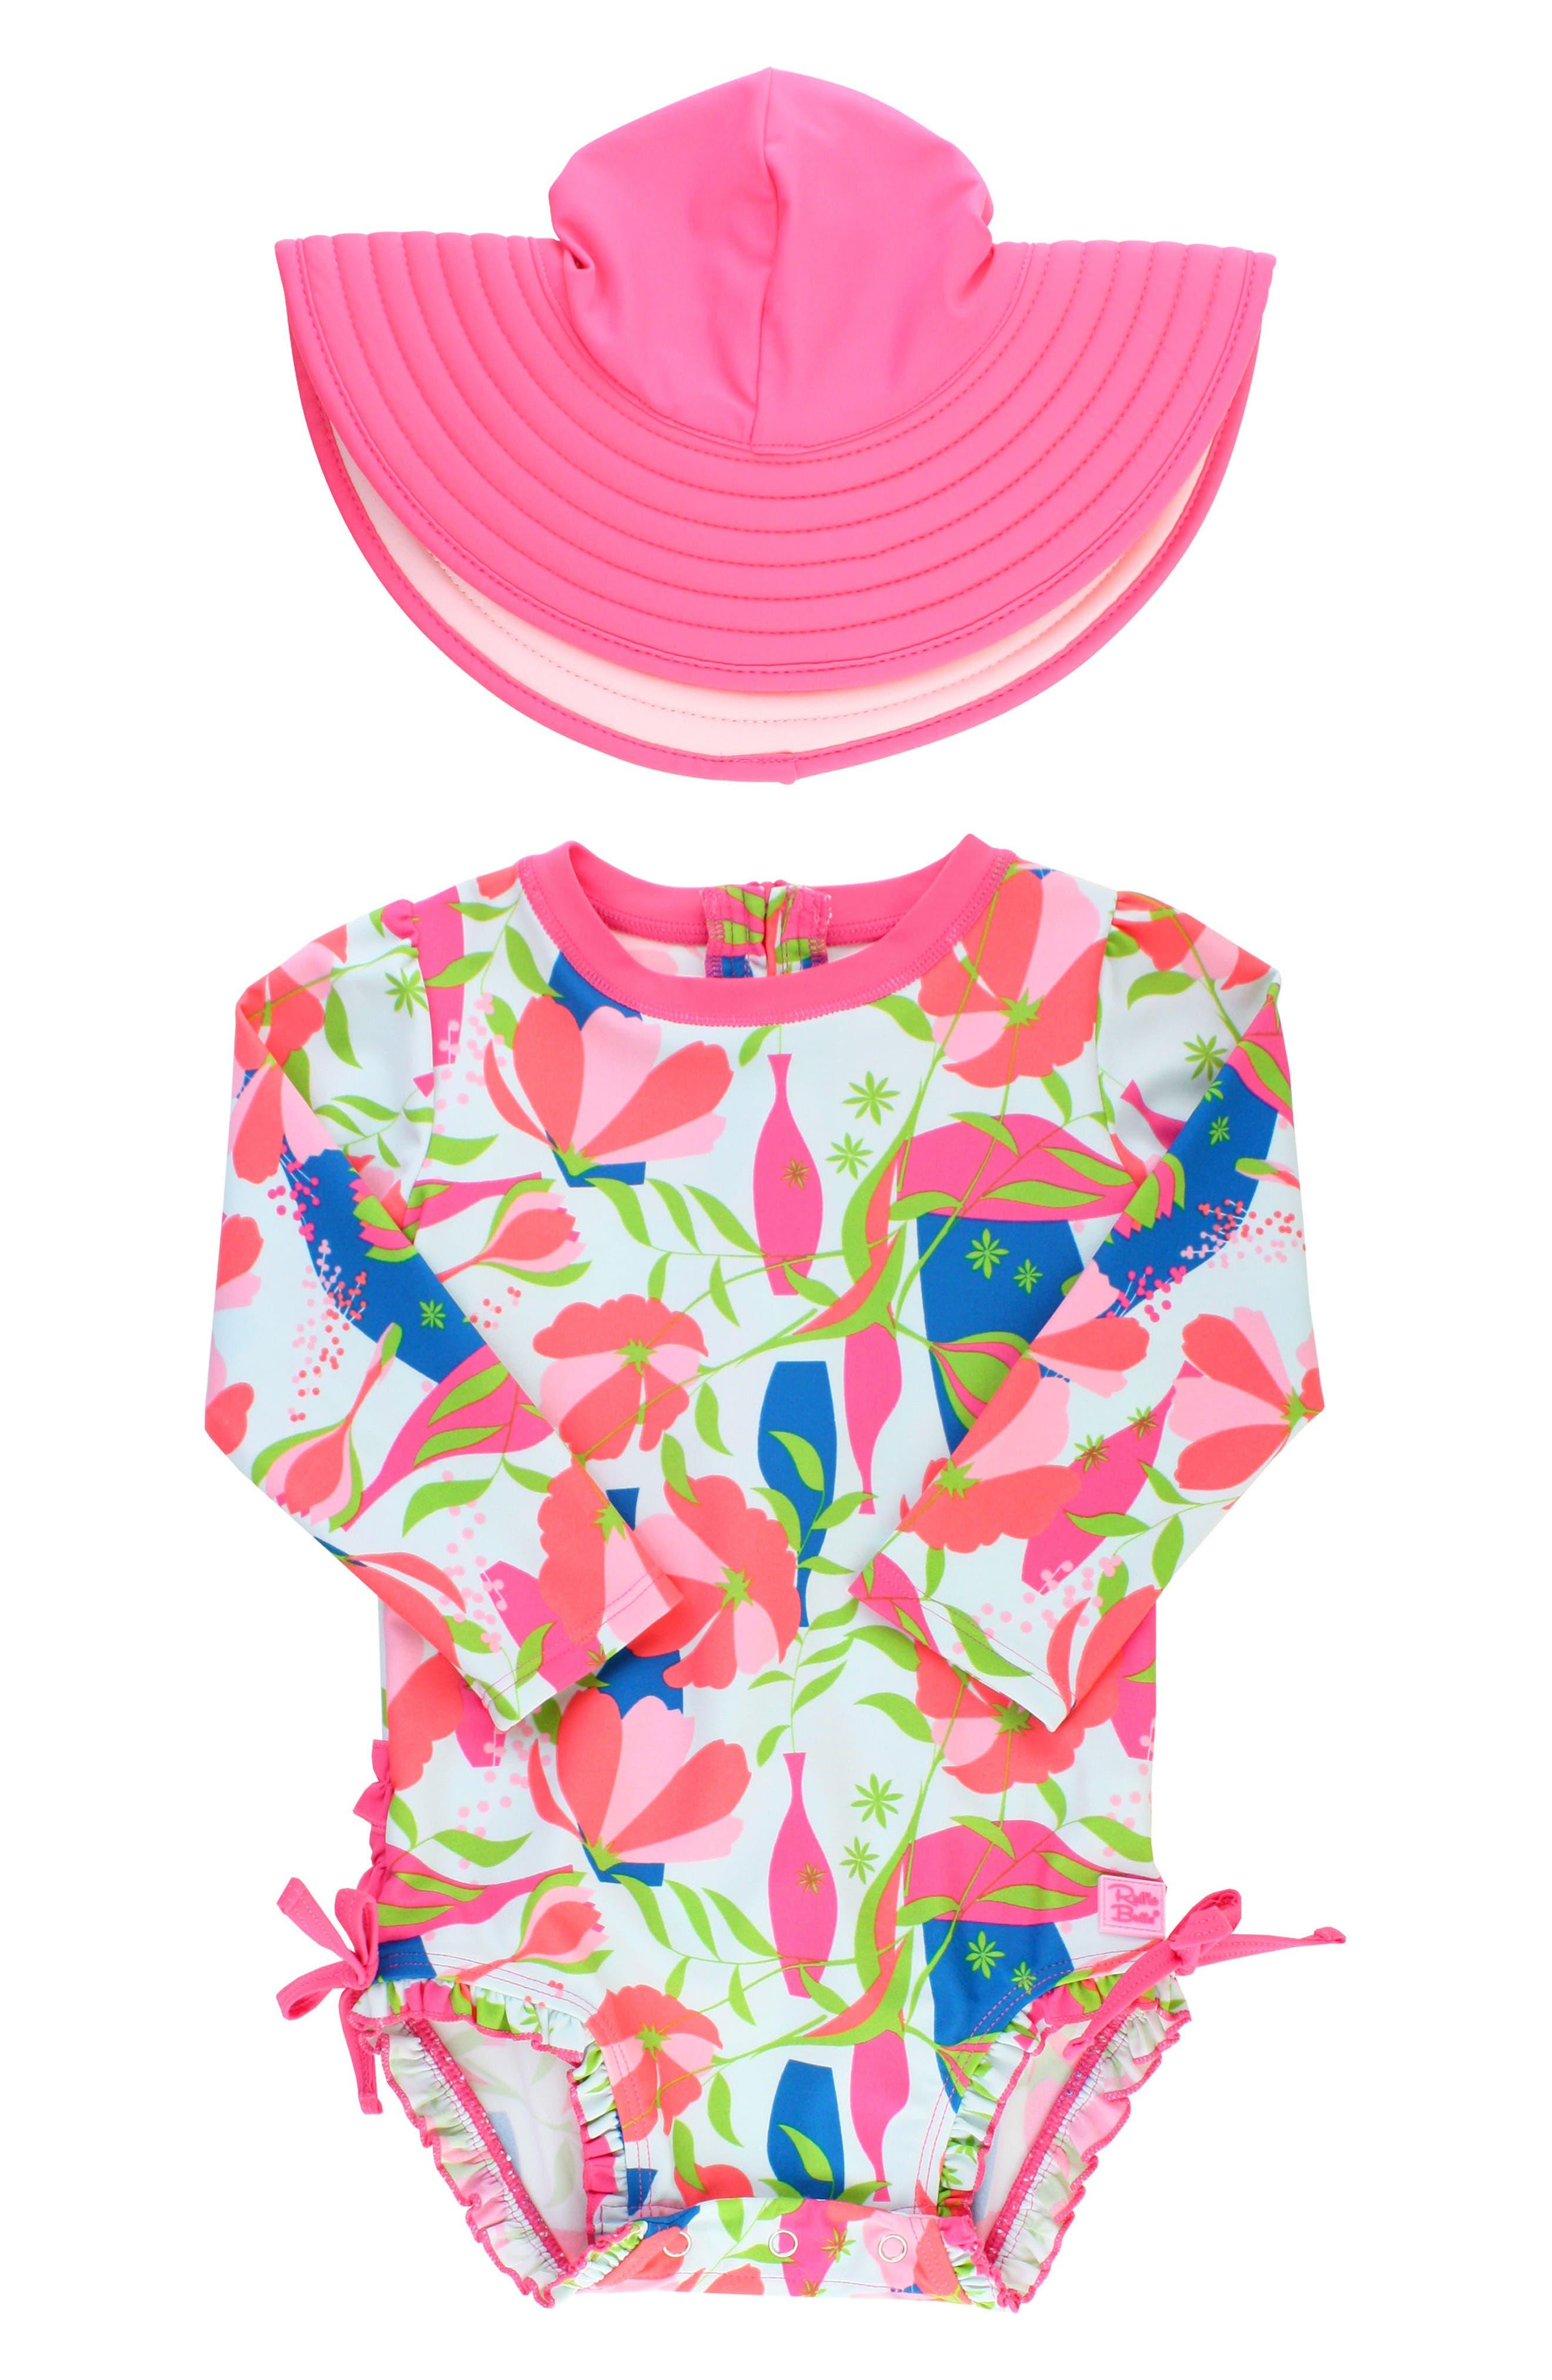 Main Image - Ruffle Butts Jeweled Stems One-Piece Rashguard Swimsuit & Sun Hat Set (Baby Girls)